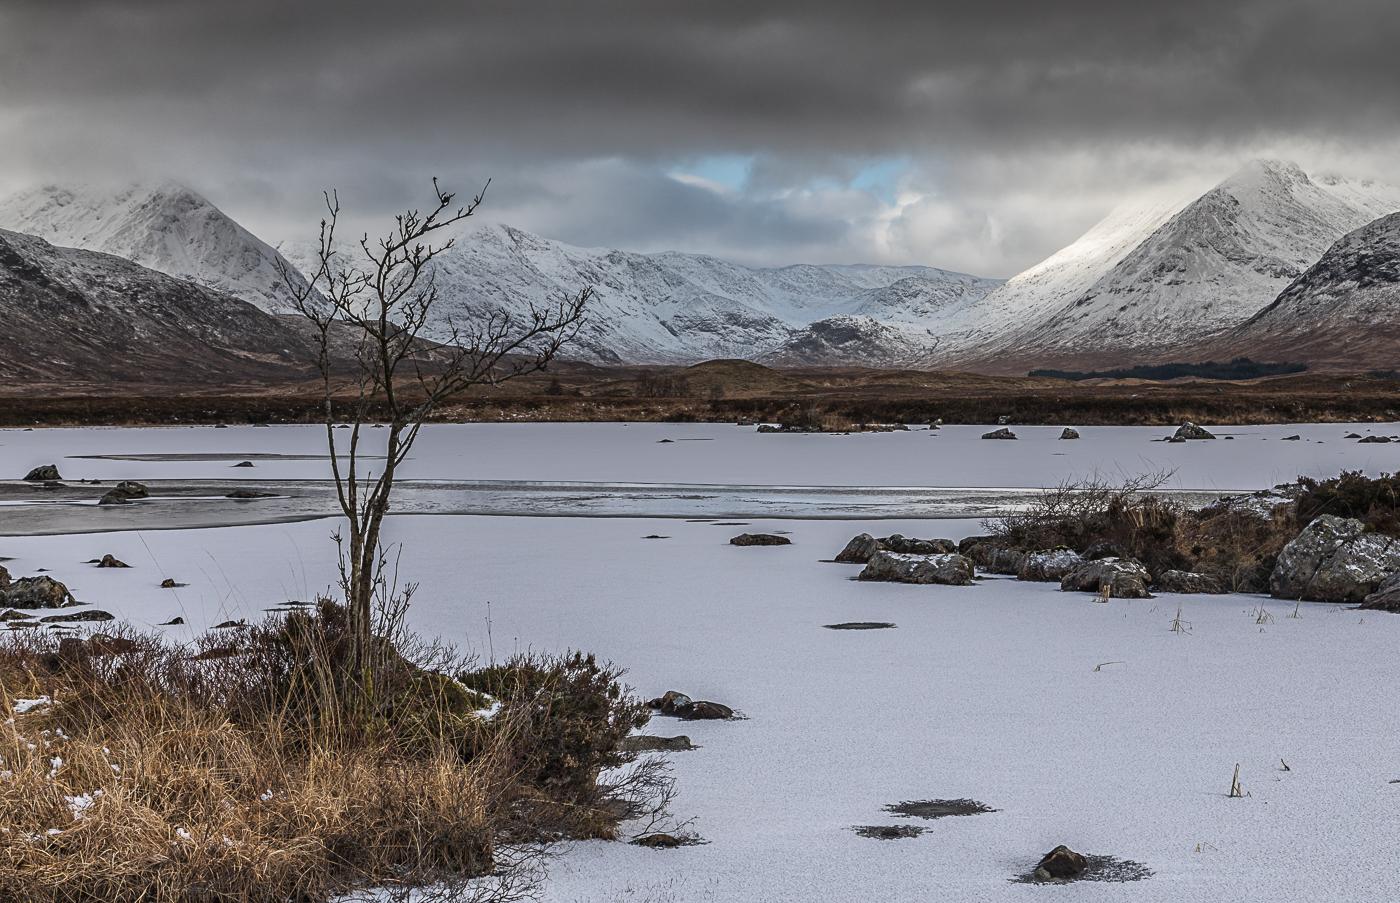 Winter in Rannoch Moor